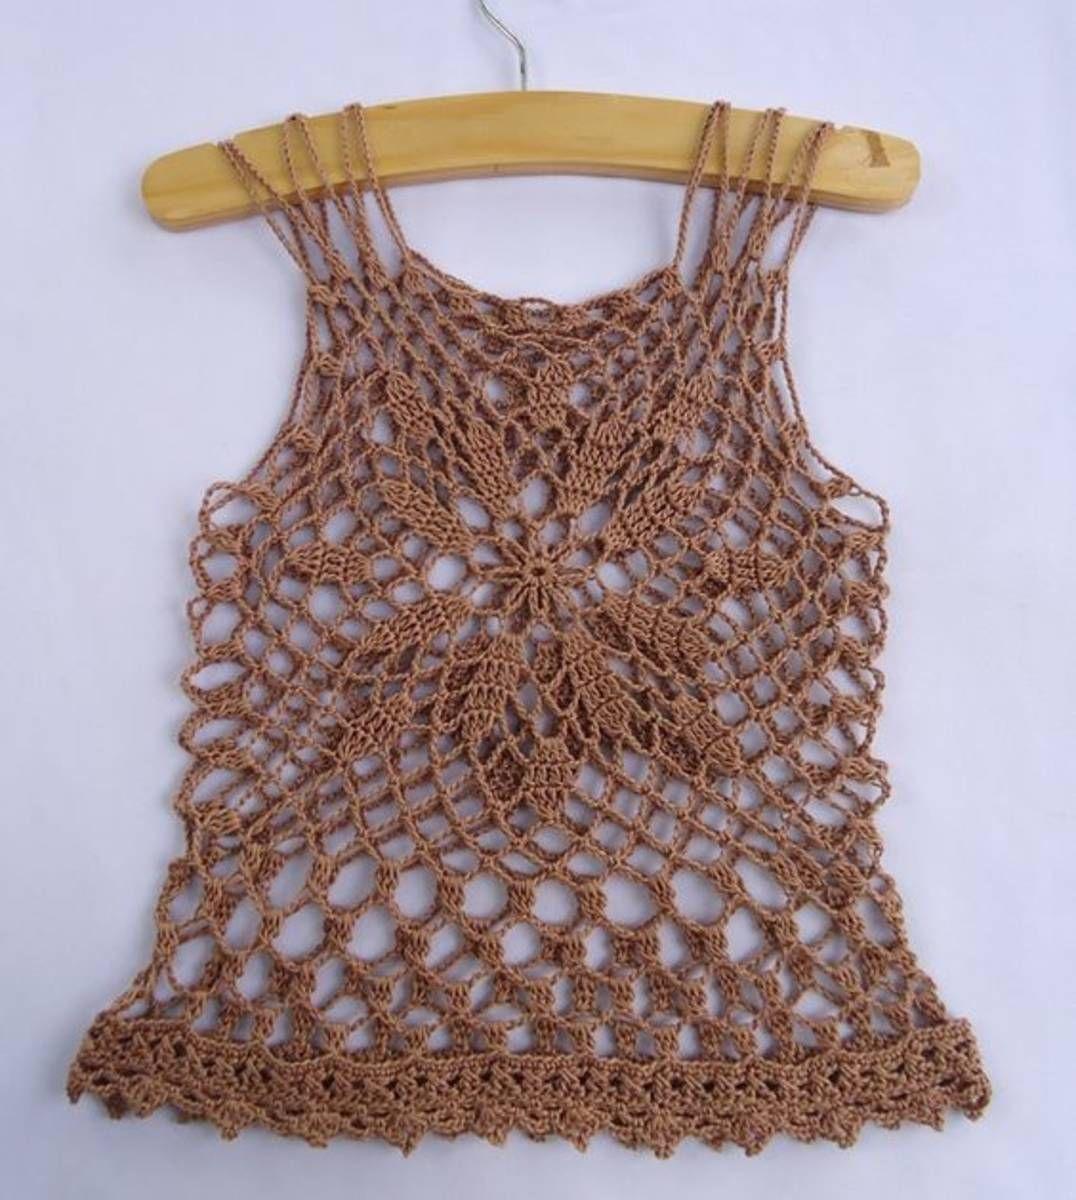 Camiseta em Croche | croche | Pinterest | Crochet, Crocheting ...